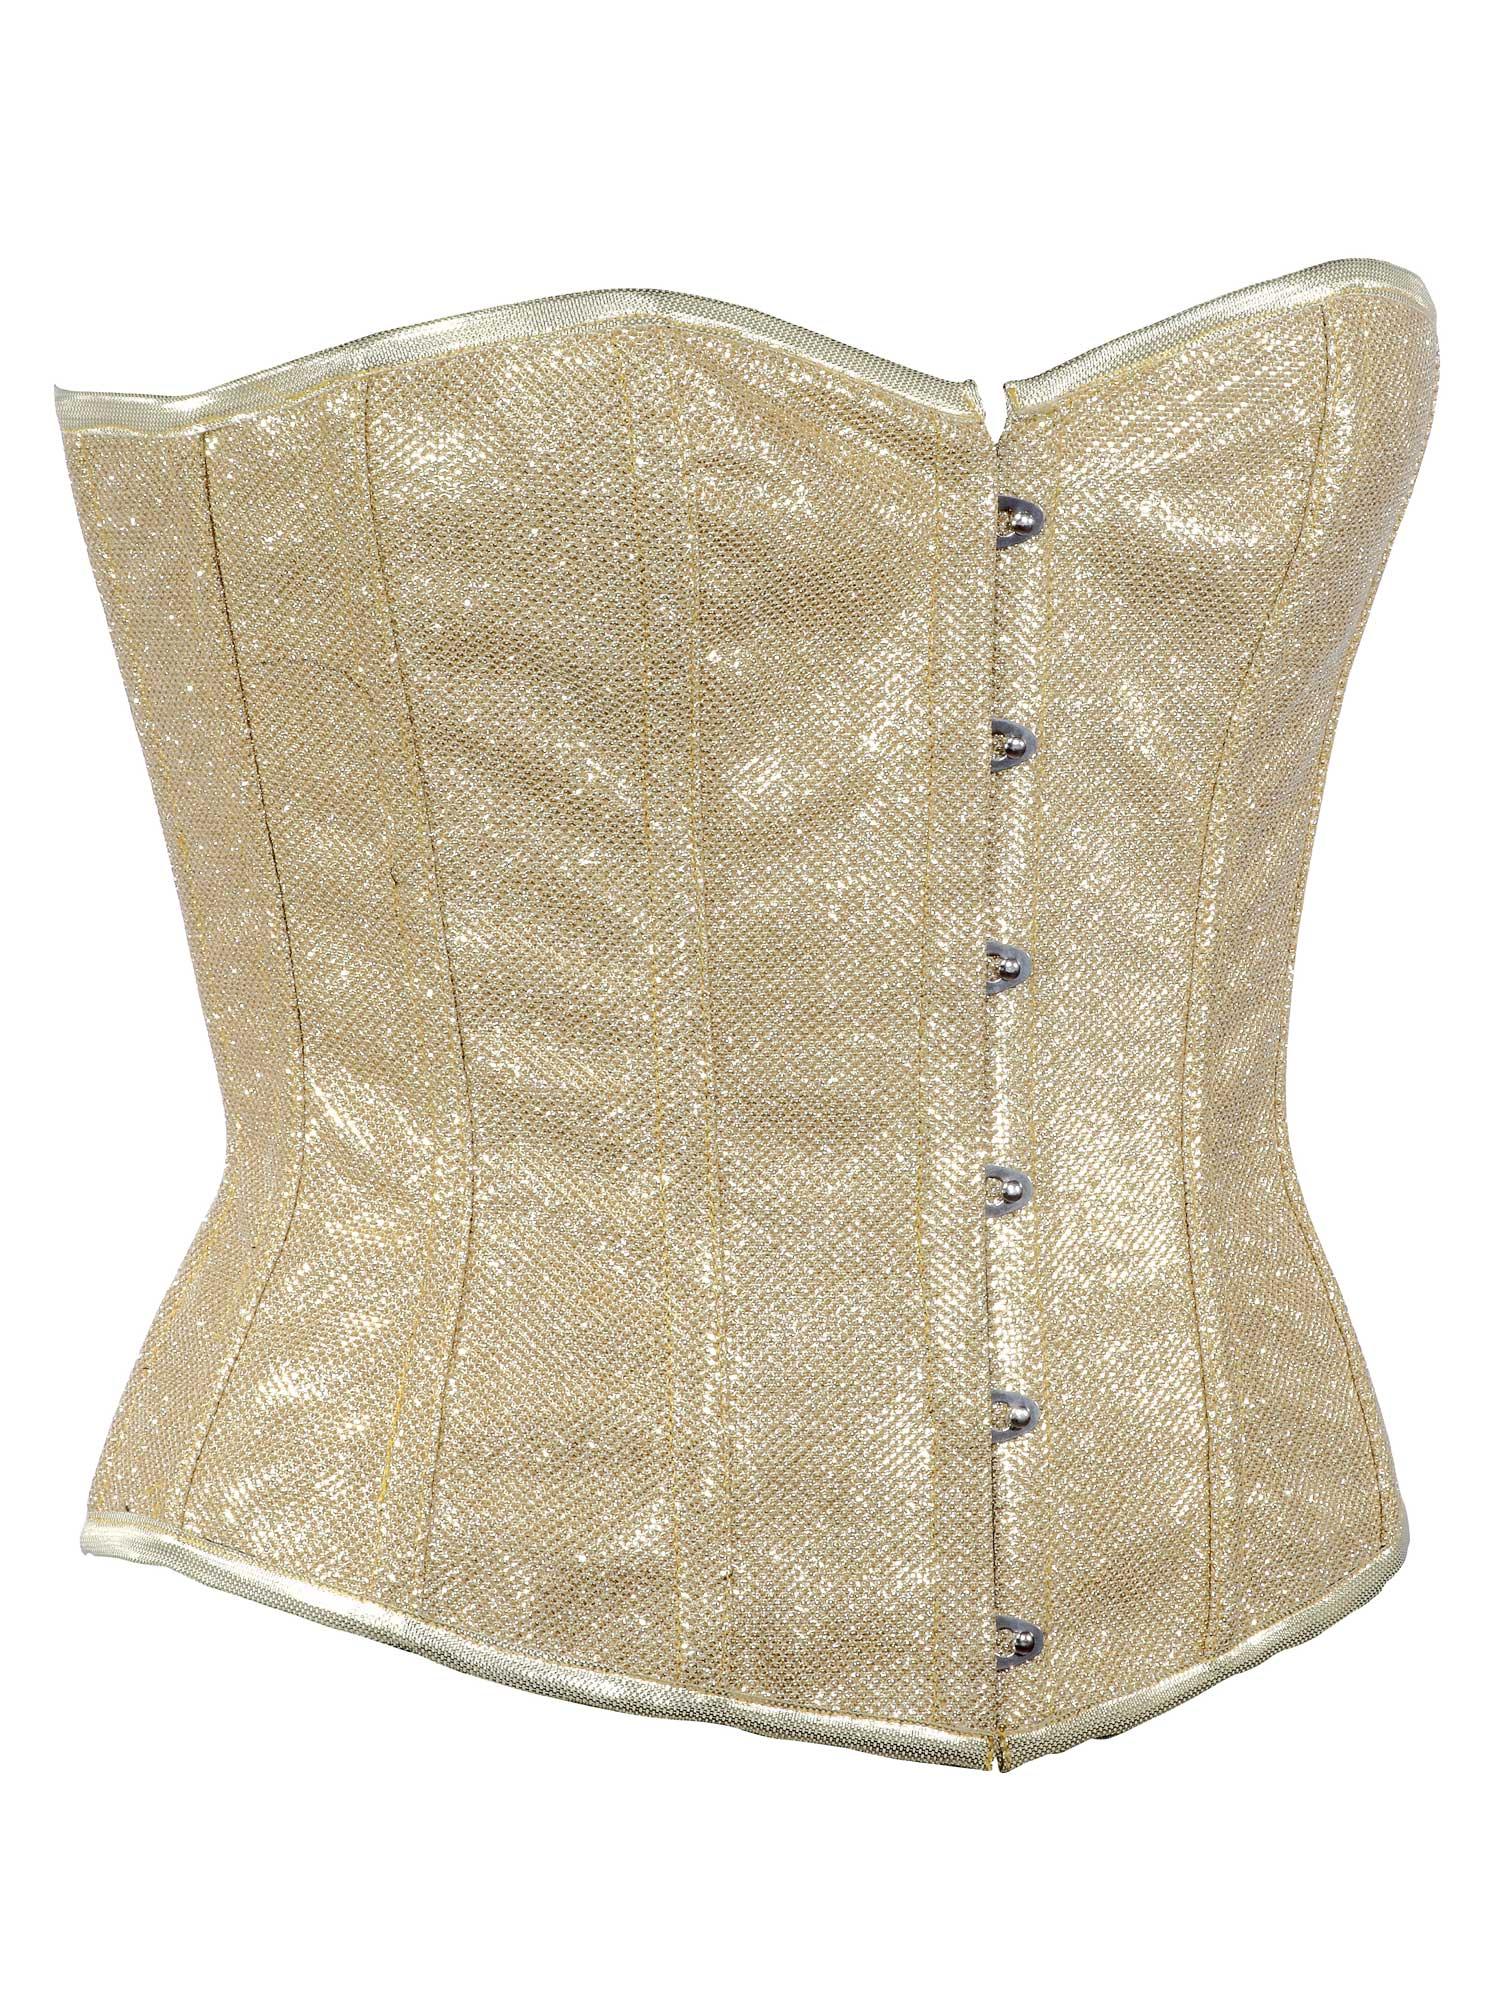 sparkling_gold_fabric_steel_boning_overbust_corset_waist_cincher_bustier_bustiers_and_corsets_4.jpg